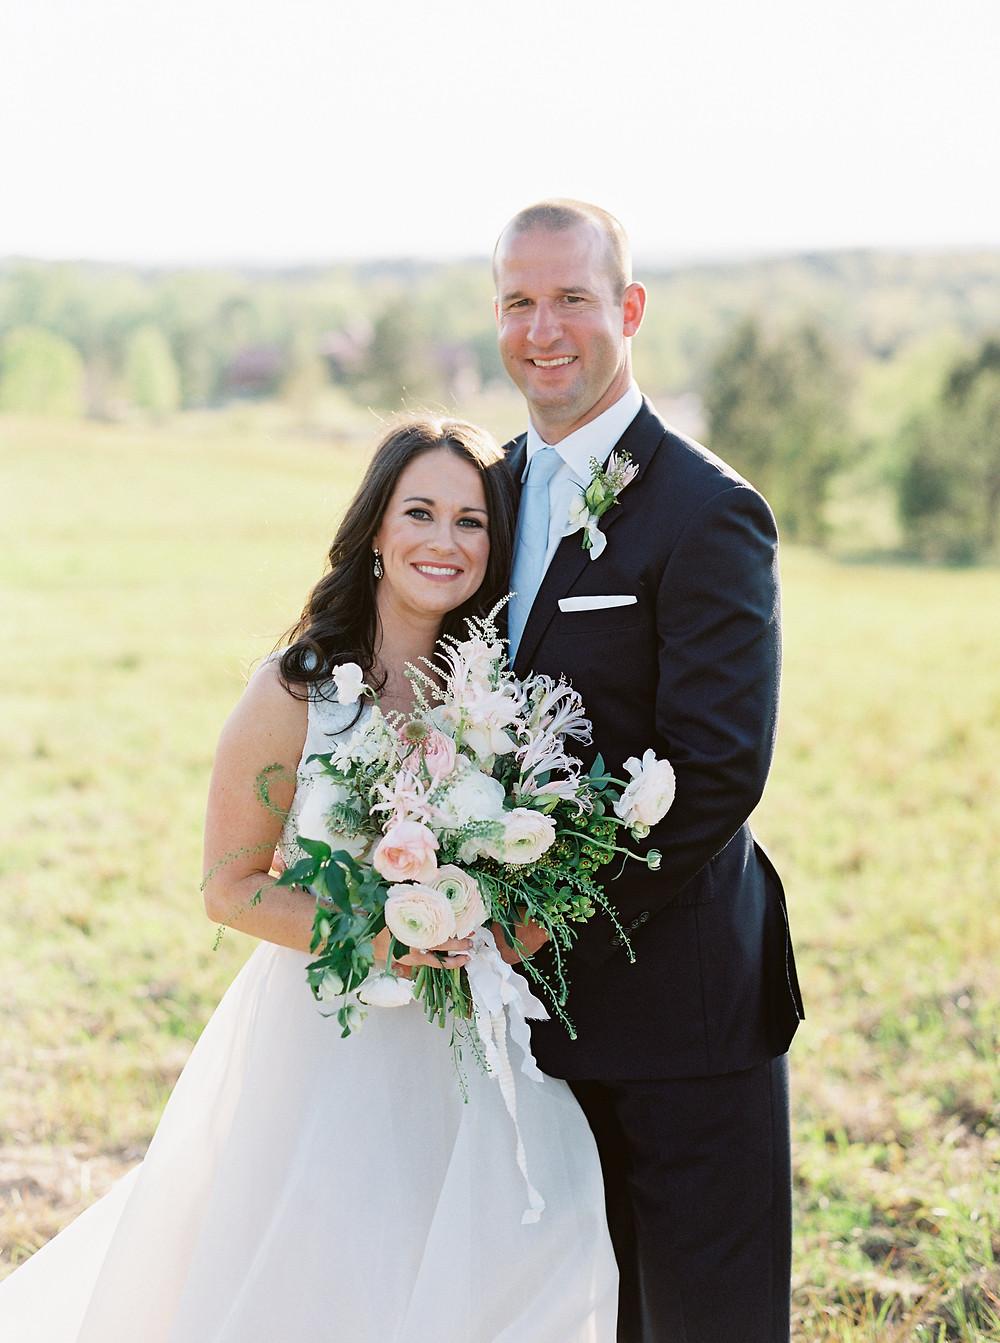 alabama wedding flowers, bride, groom bouquet